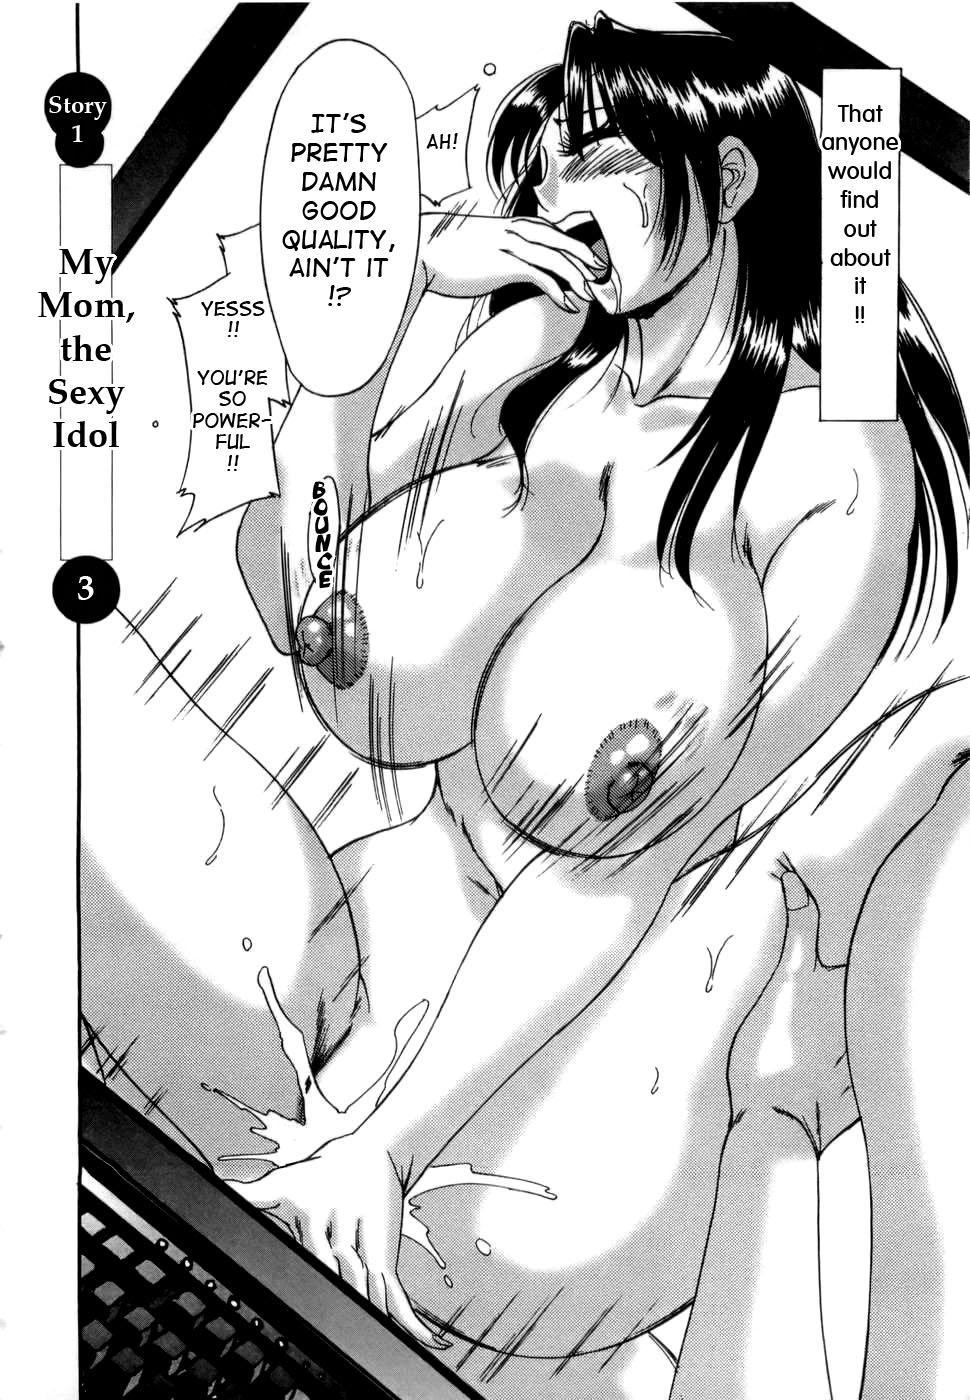 Haha wa Sexy Idol | My Mom, The Sexy Idol 42